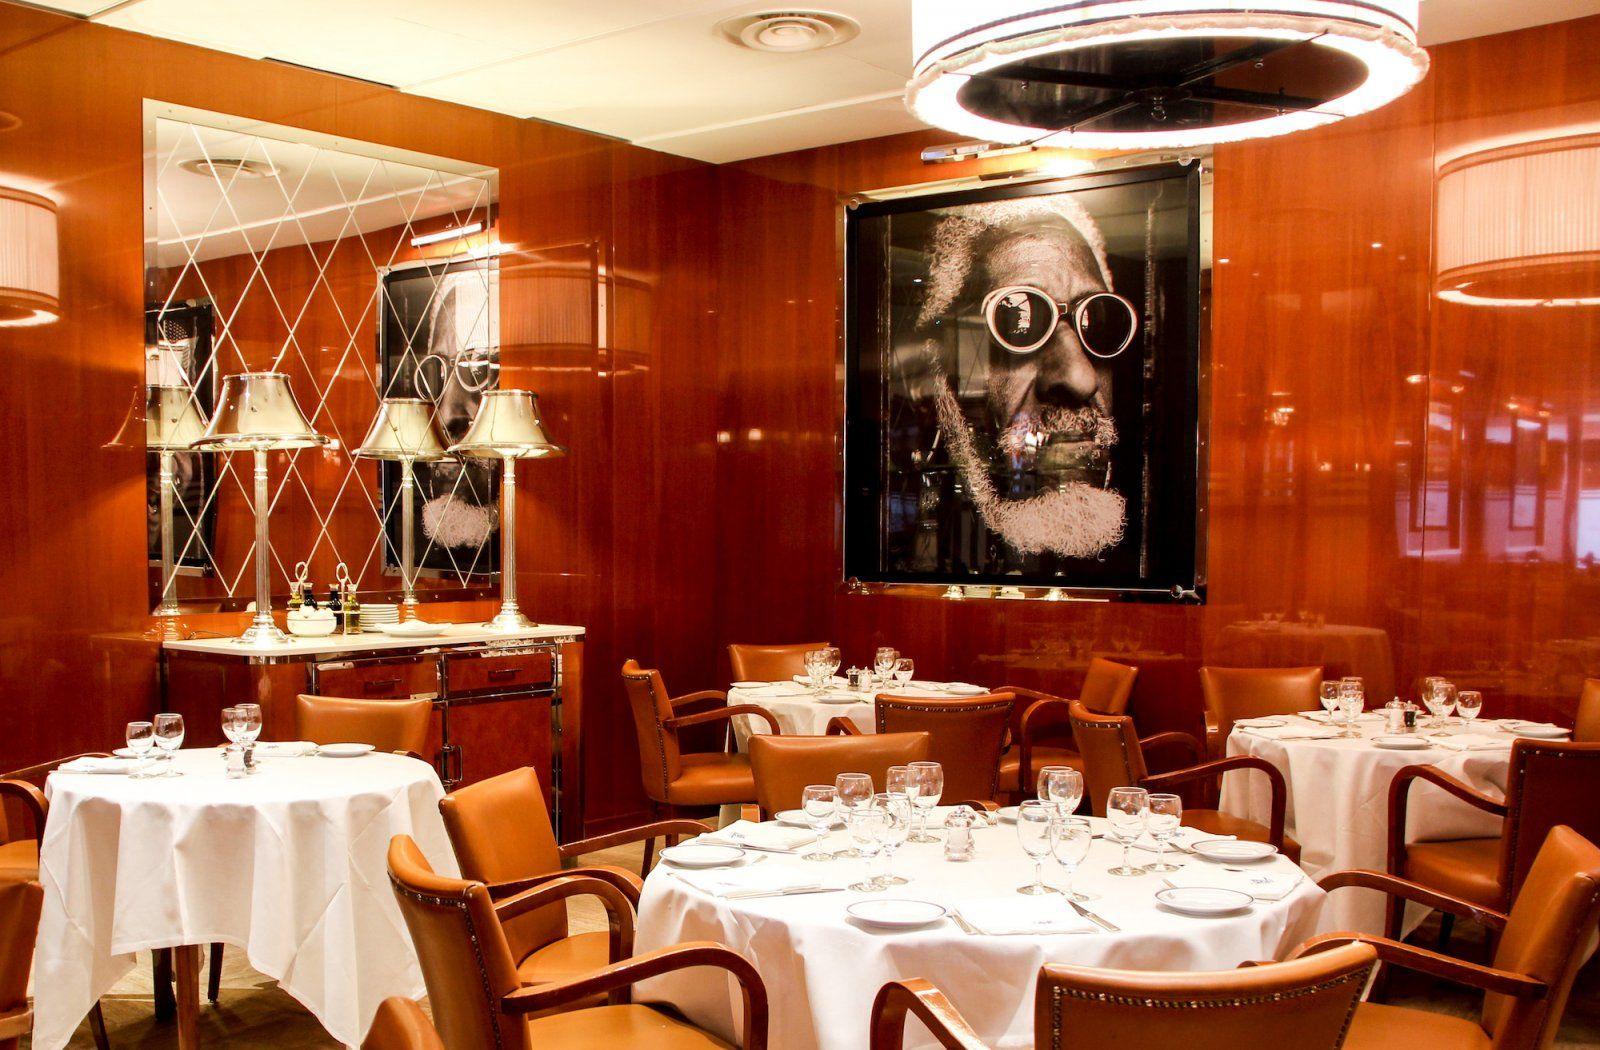 C London Mayfair Restaurant Bar Italy Italian Cuisine Italian Cuisine Restaurant London Restaurants Gourmet Foodie